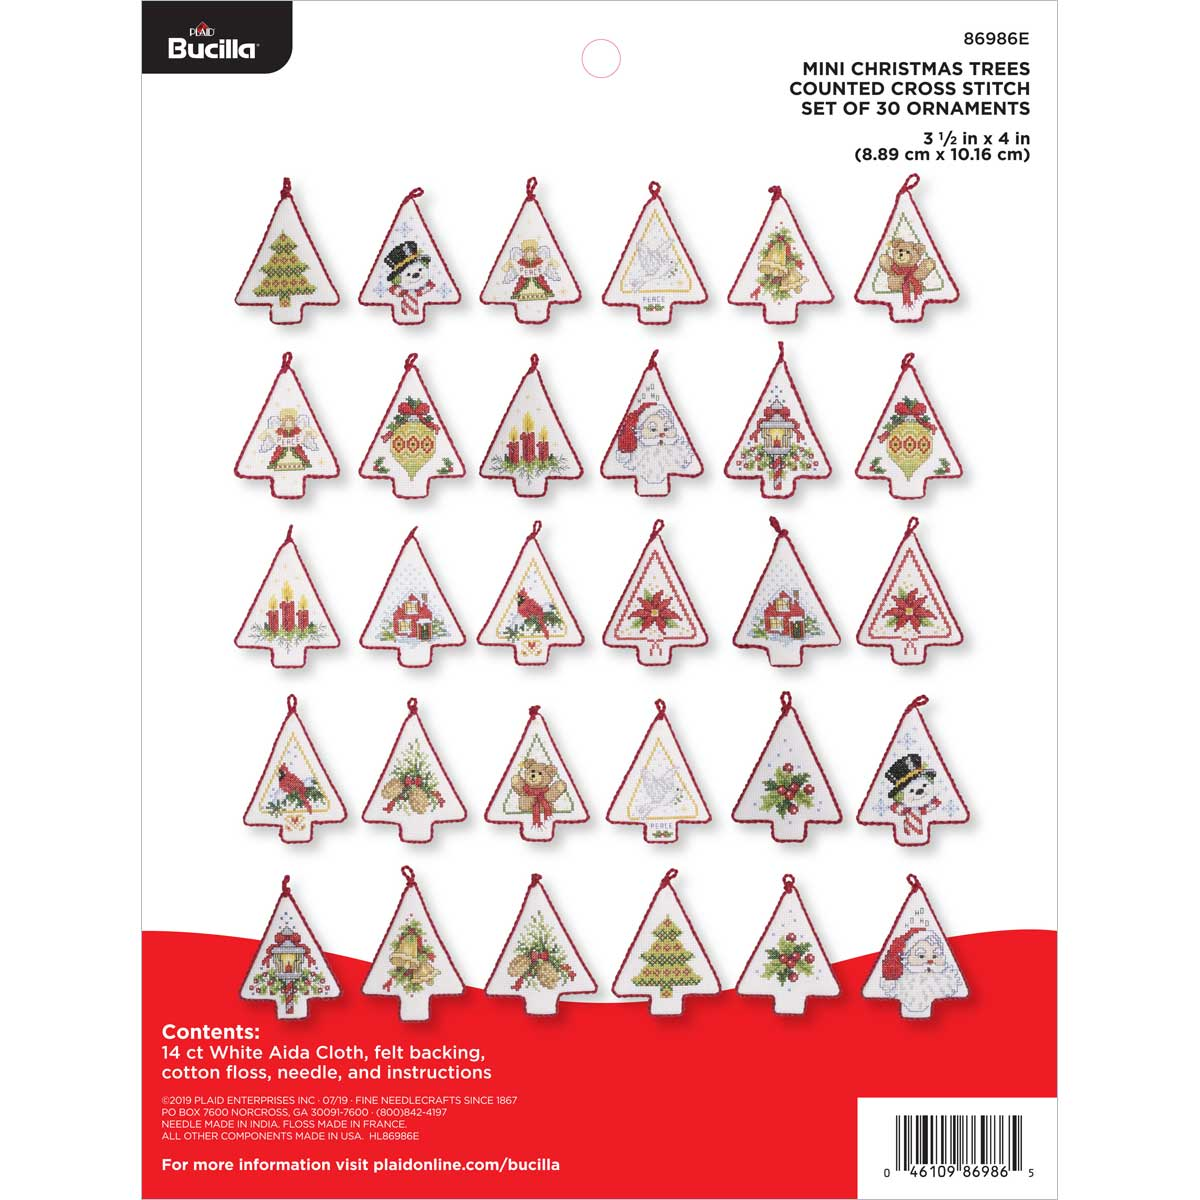 Bucilla ® Seasonal - Counted Cross Stitch - Ornament Kits - Mini Christmas Trees